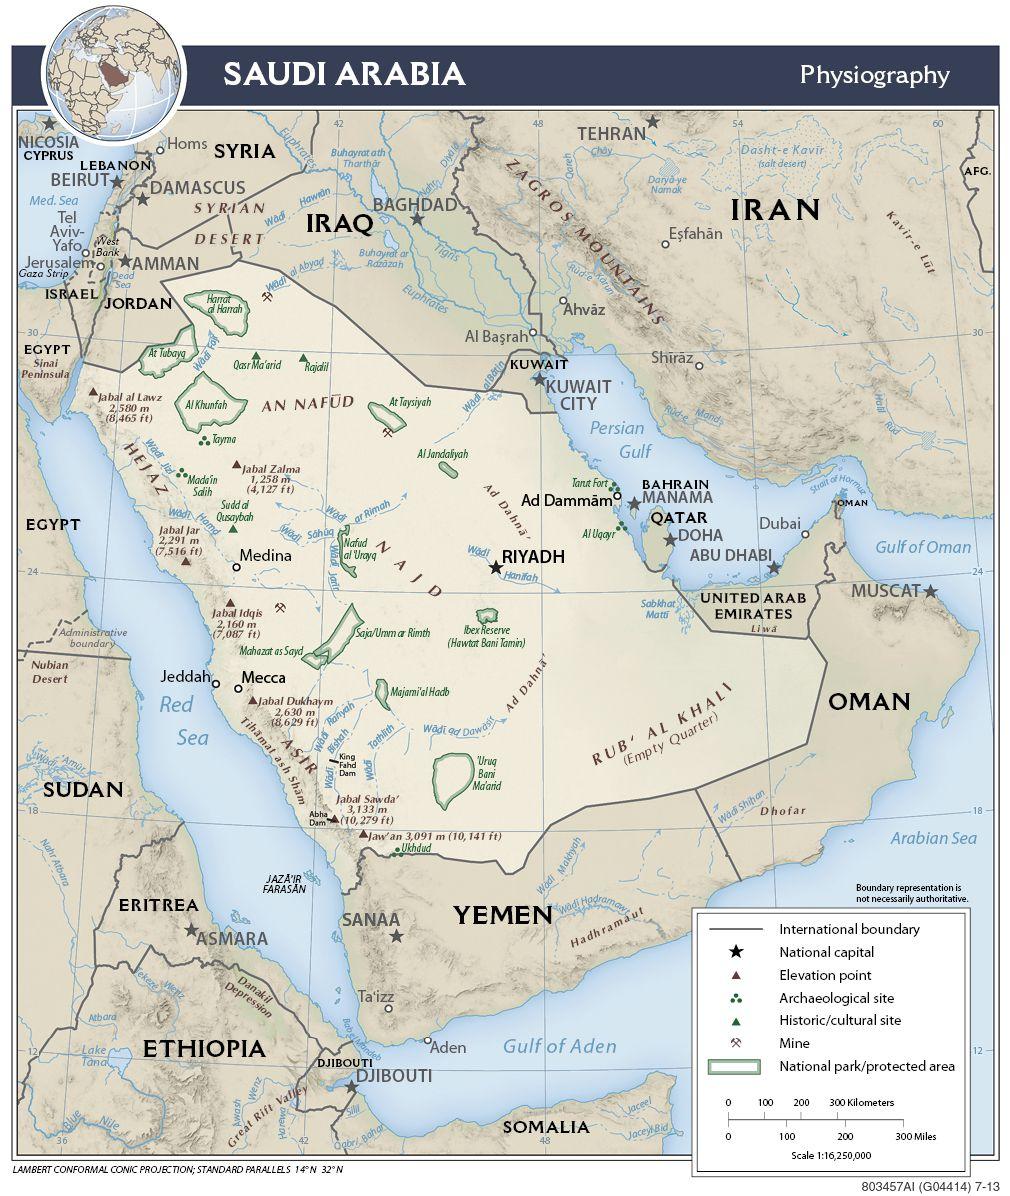 Carte de l'Arabie Saoudite - Politique